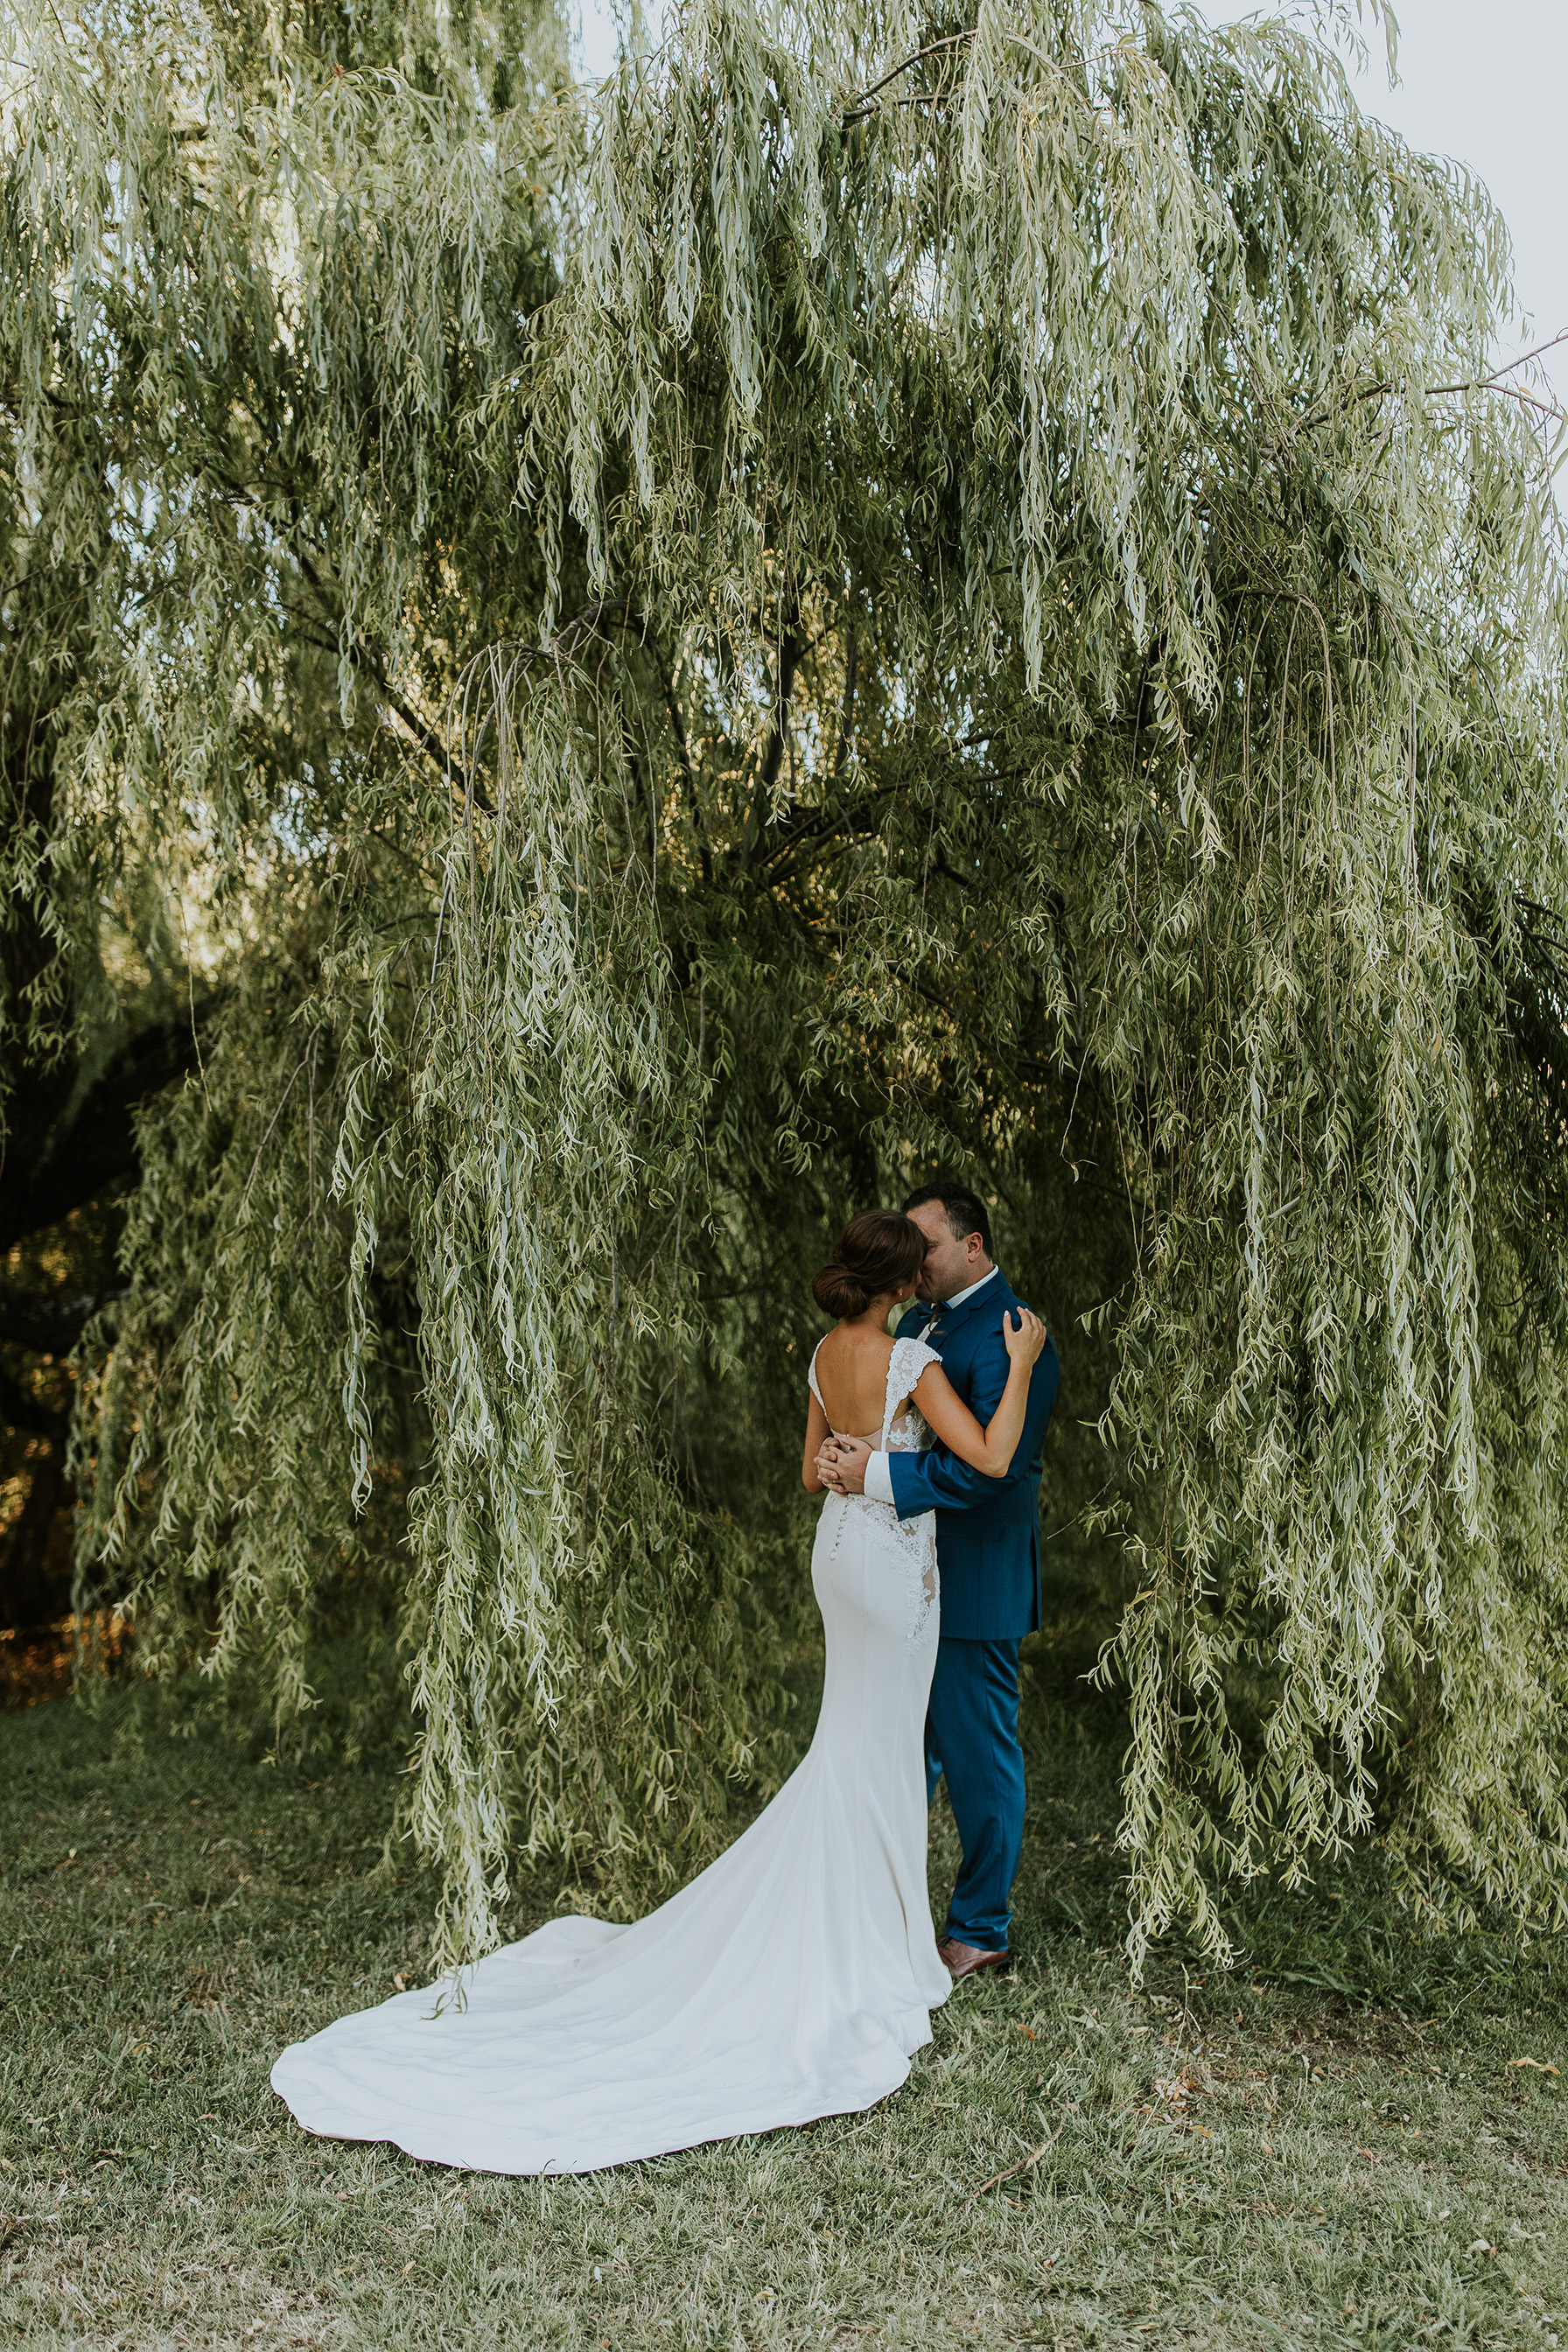 keli-luke-maybury-wedding-342_1.jpg